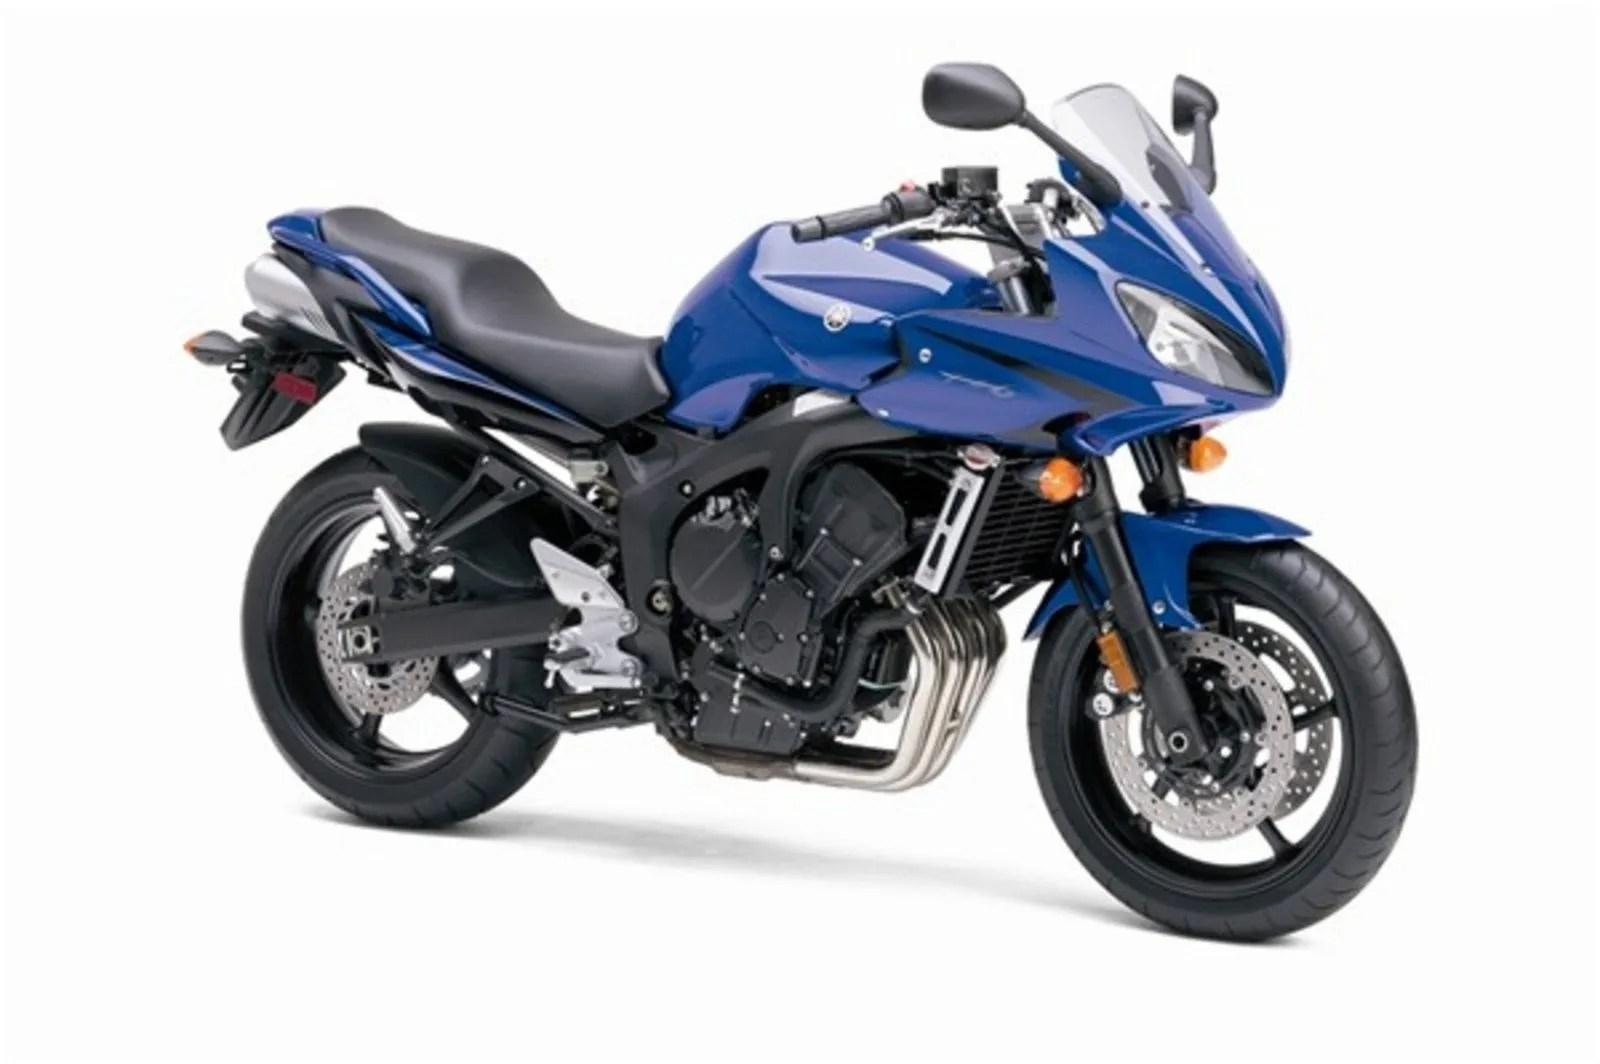 Motorcycle Parts Yamaha Fz600 Fz 600 Wiring Diagram